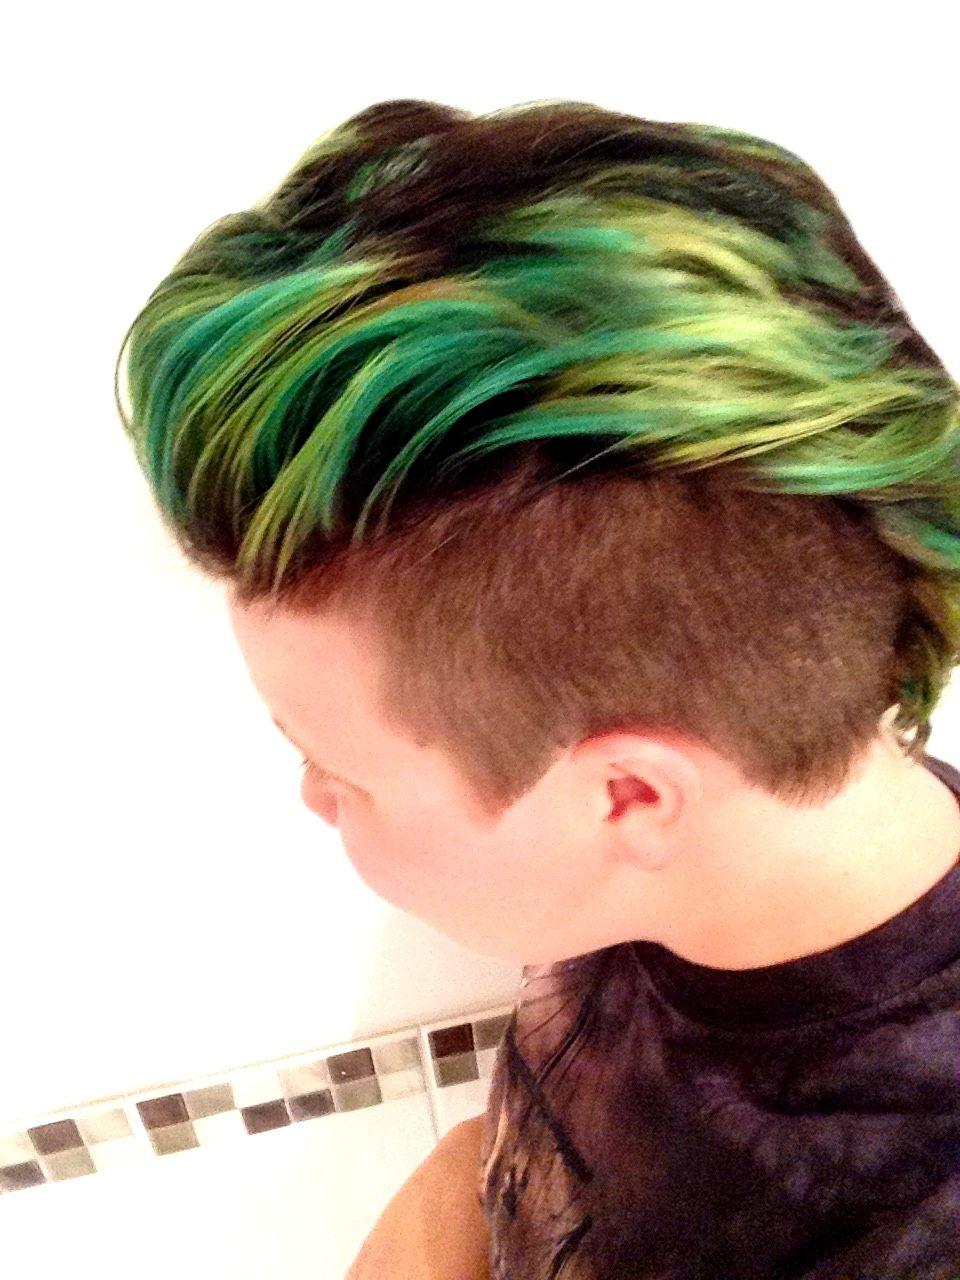 green hair jan-april '15